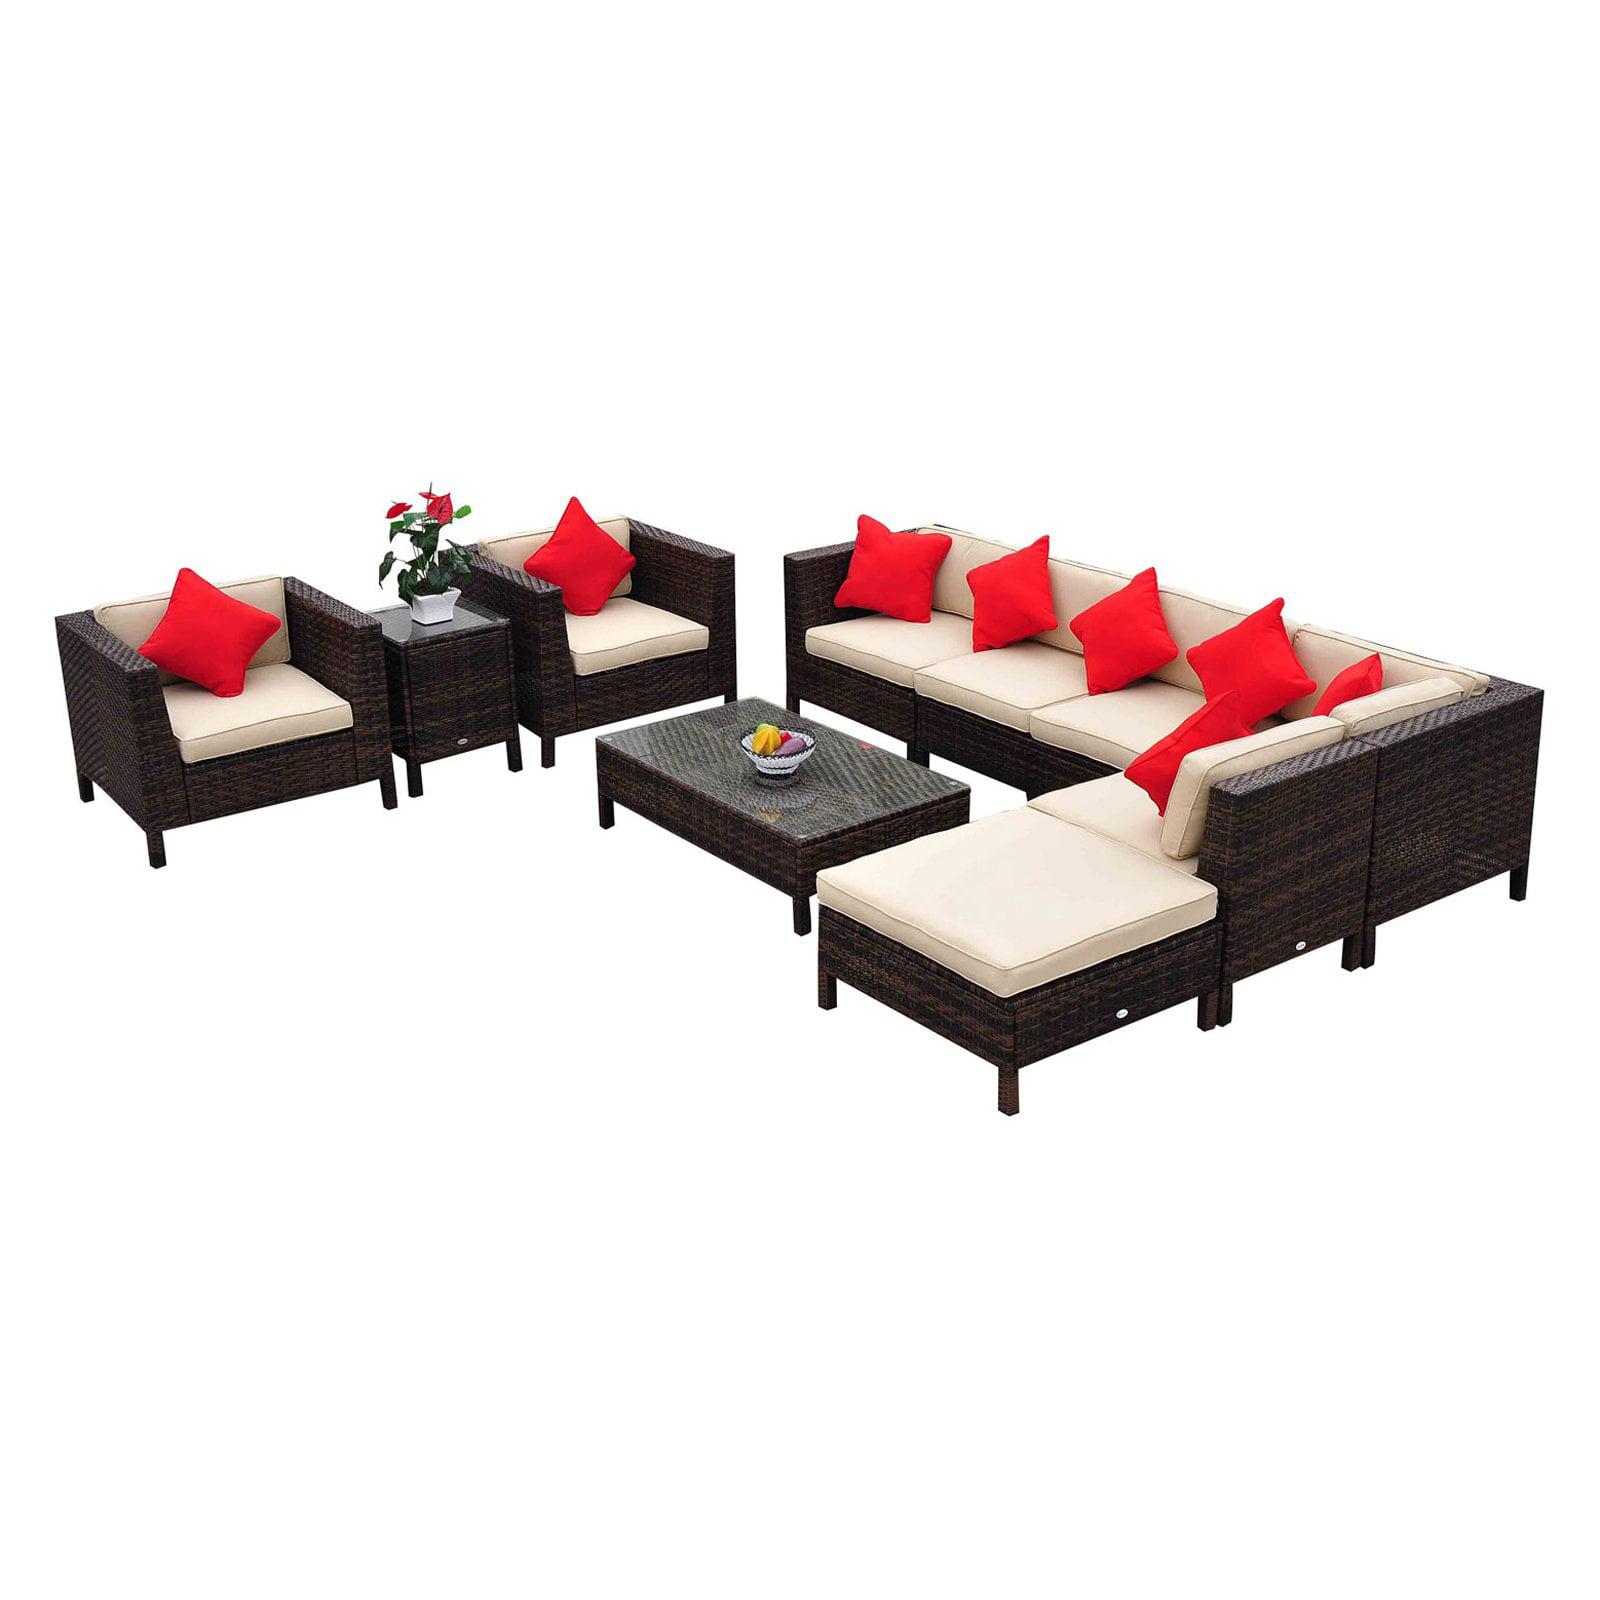 Outsunny 9 Piece Outdoor Rattan Wicker Sofa Sectional Patio Conversation Set